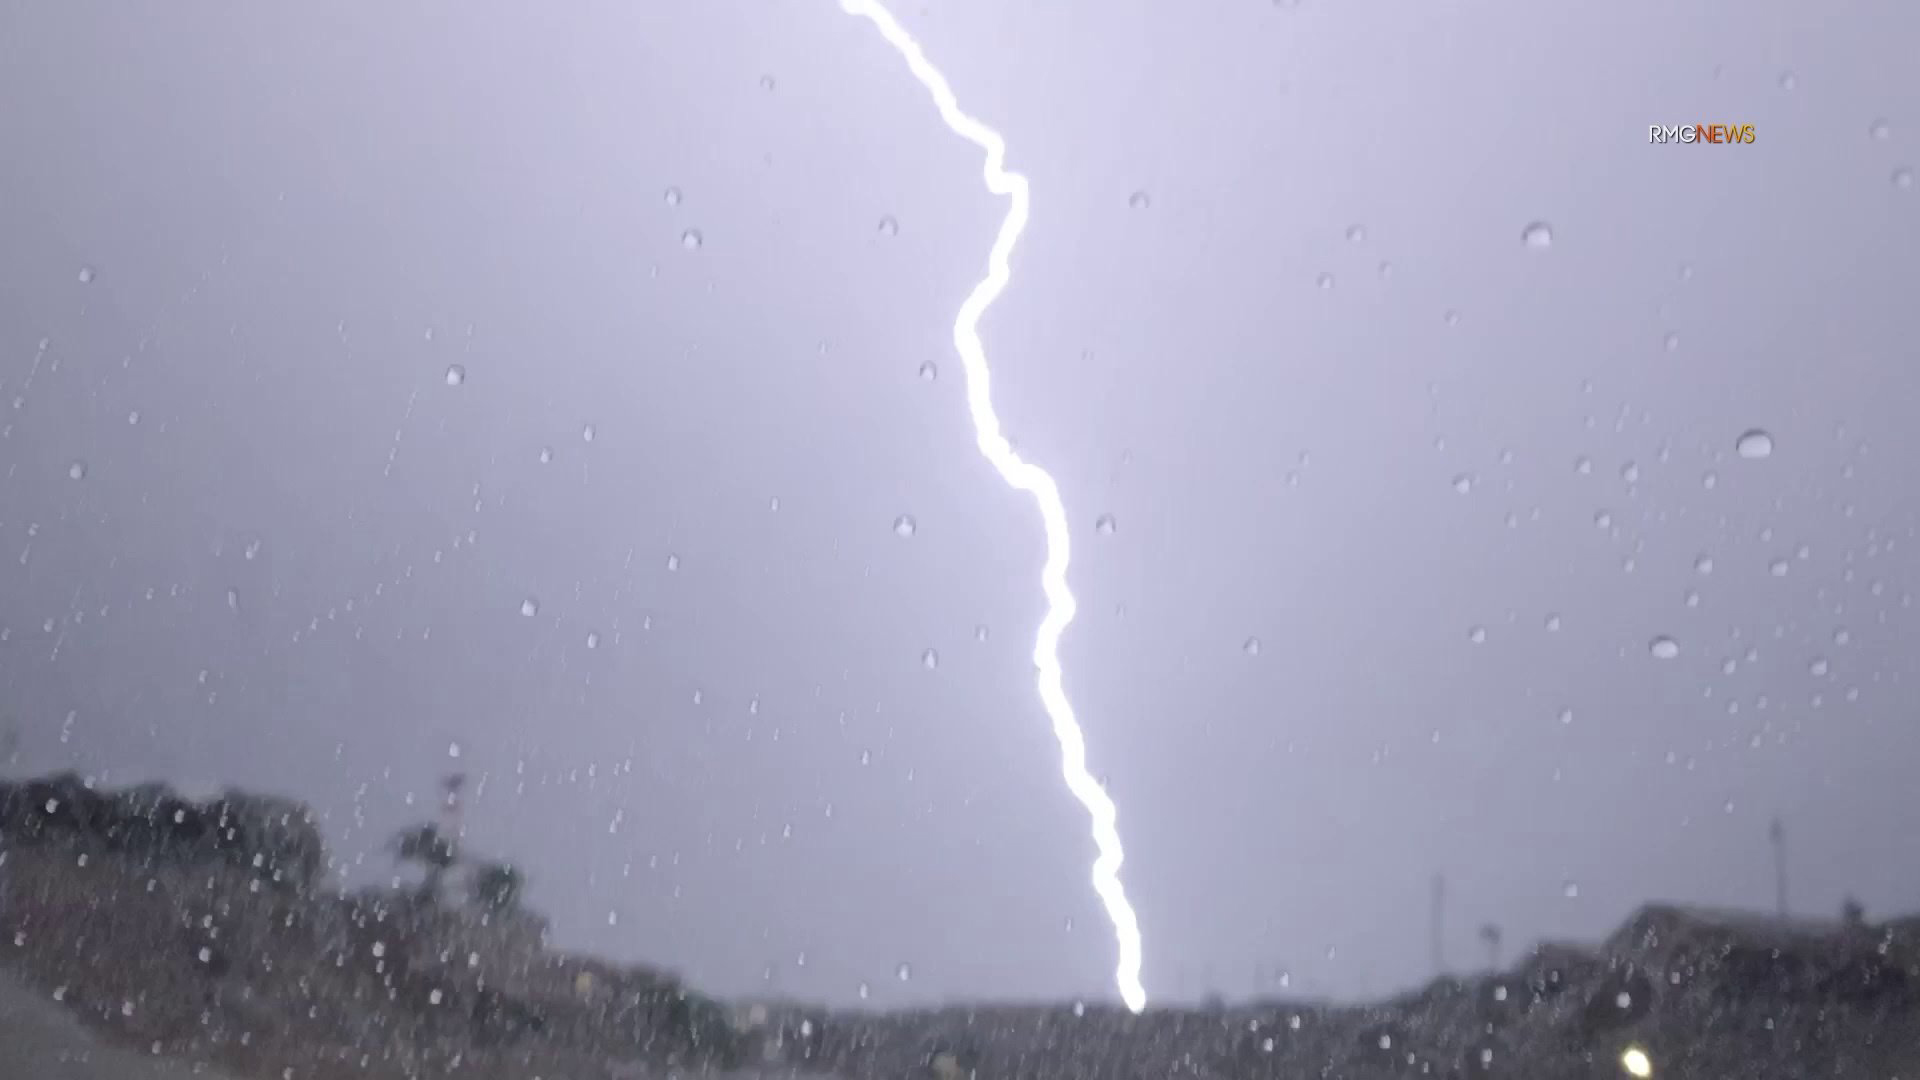 A bolt of lightning hits Riverside County on Sept. 2, 2019. (Credit: RMG News)